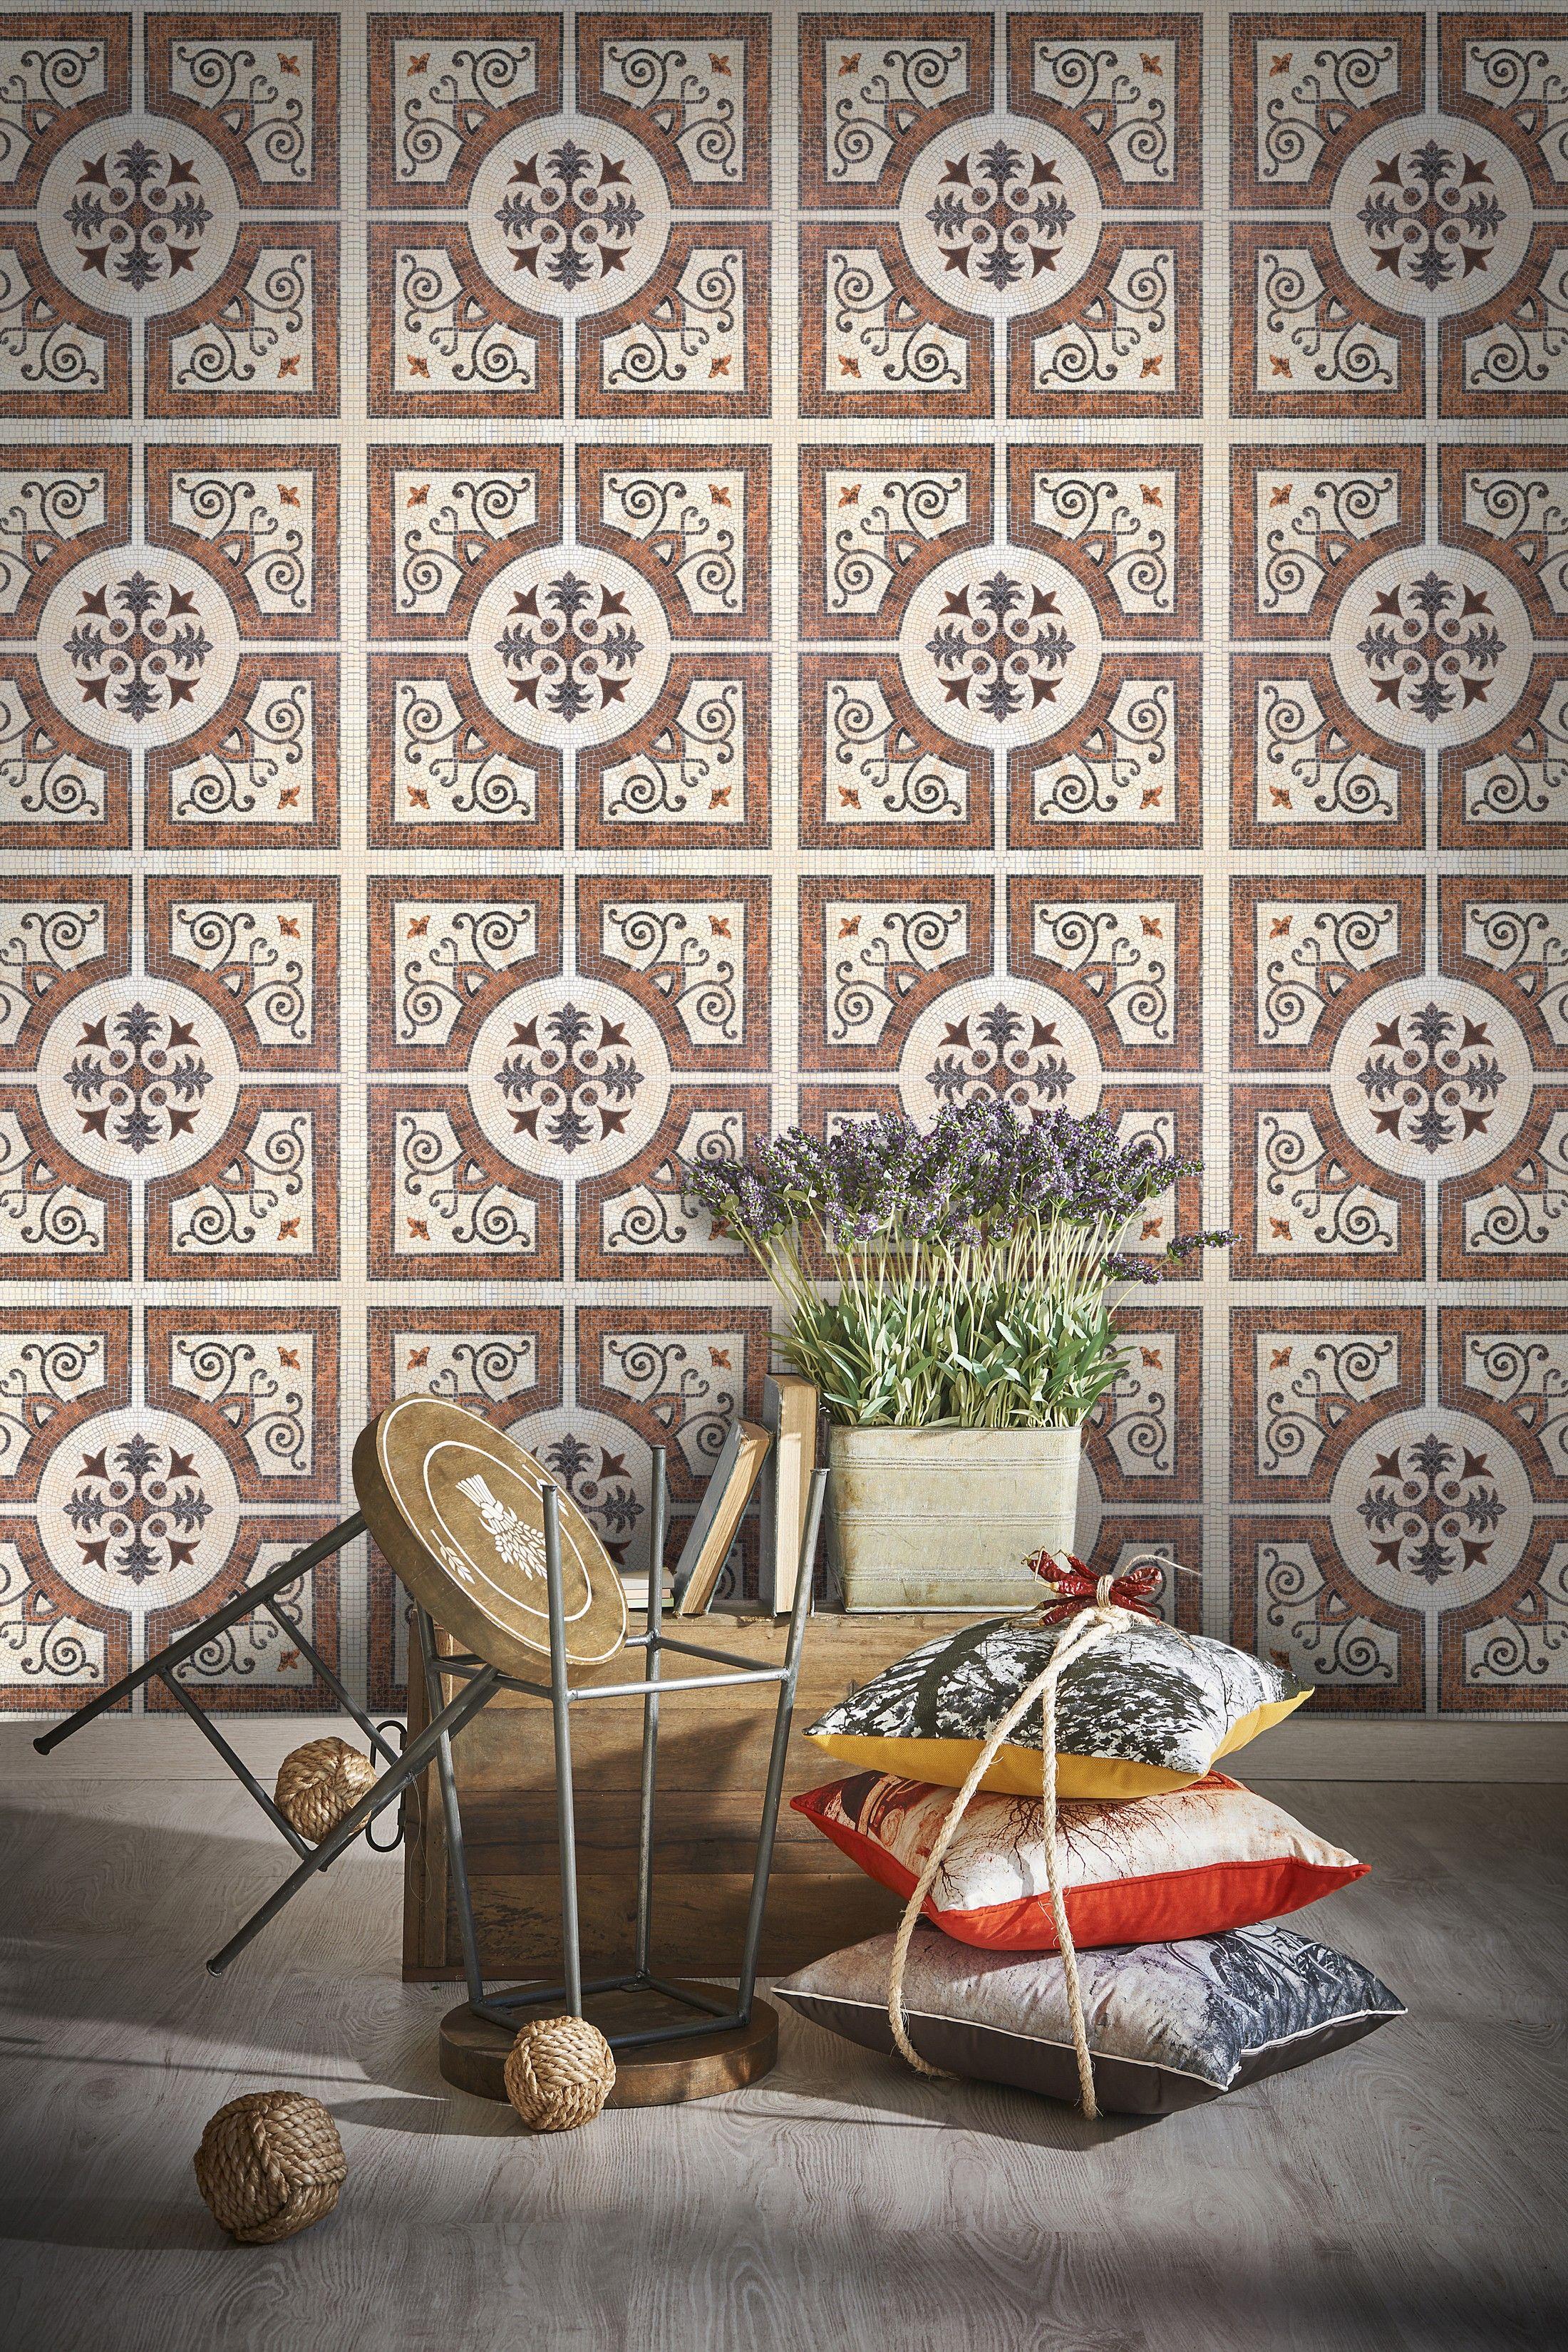 Byzantine Tile Decorative tile designs, Tile wallpaper